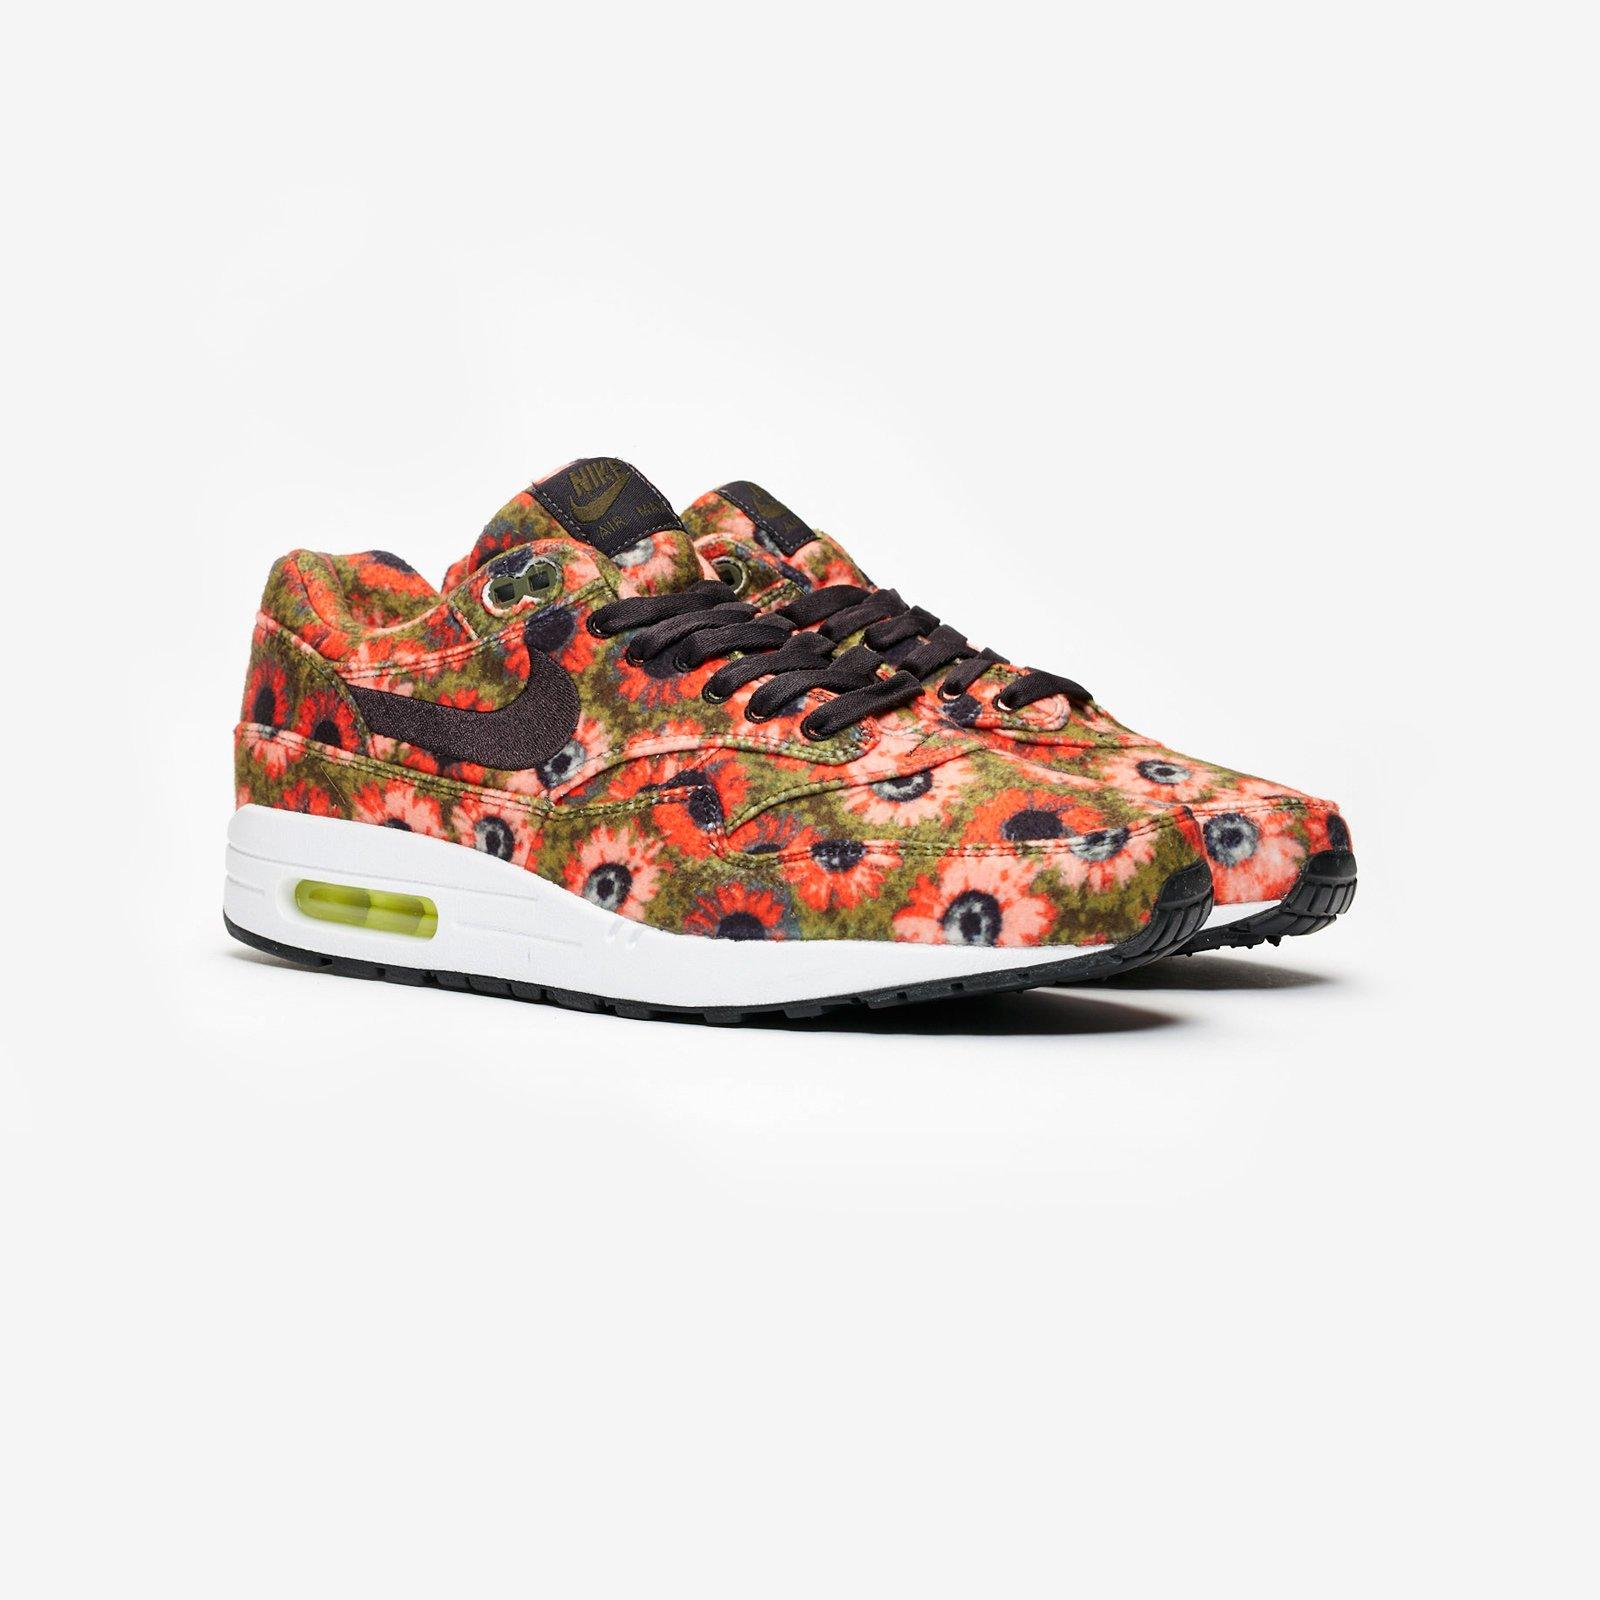 fda3b54dfd5a9 Nike Air Max 1 Premium SE - 858876-003 - Sneakersnstuff